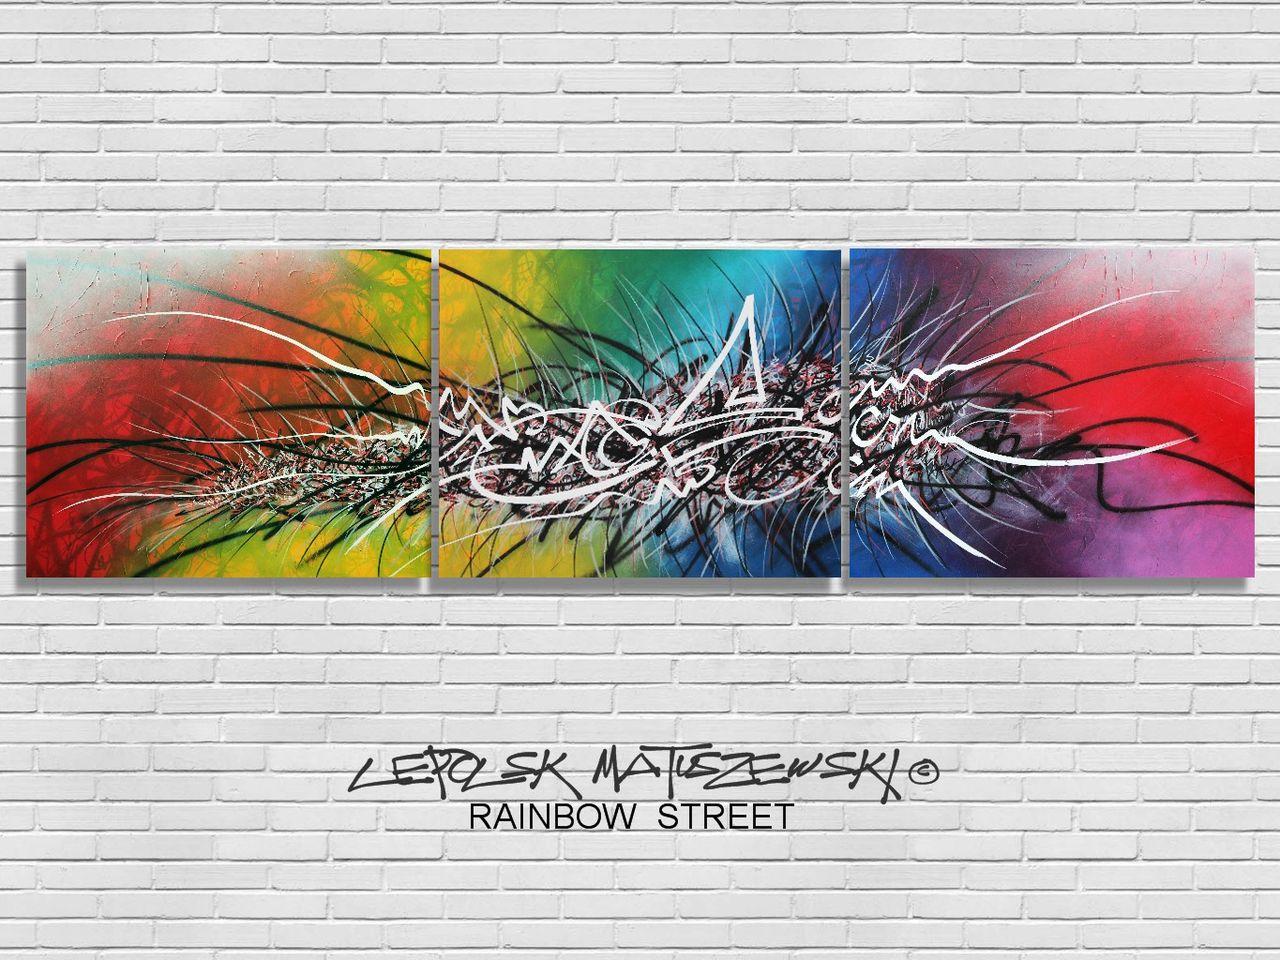 MK  Lepolsk Matuszewski RAINBOW STREET  street art calligraffiti graffiti abstrait